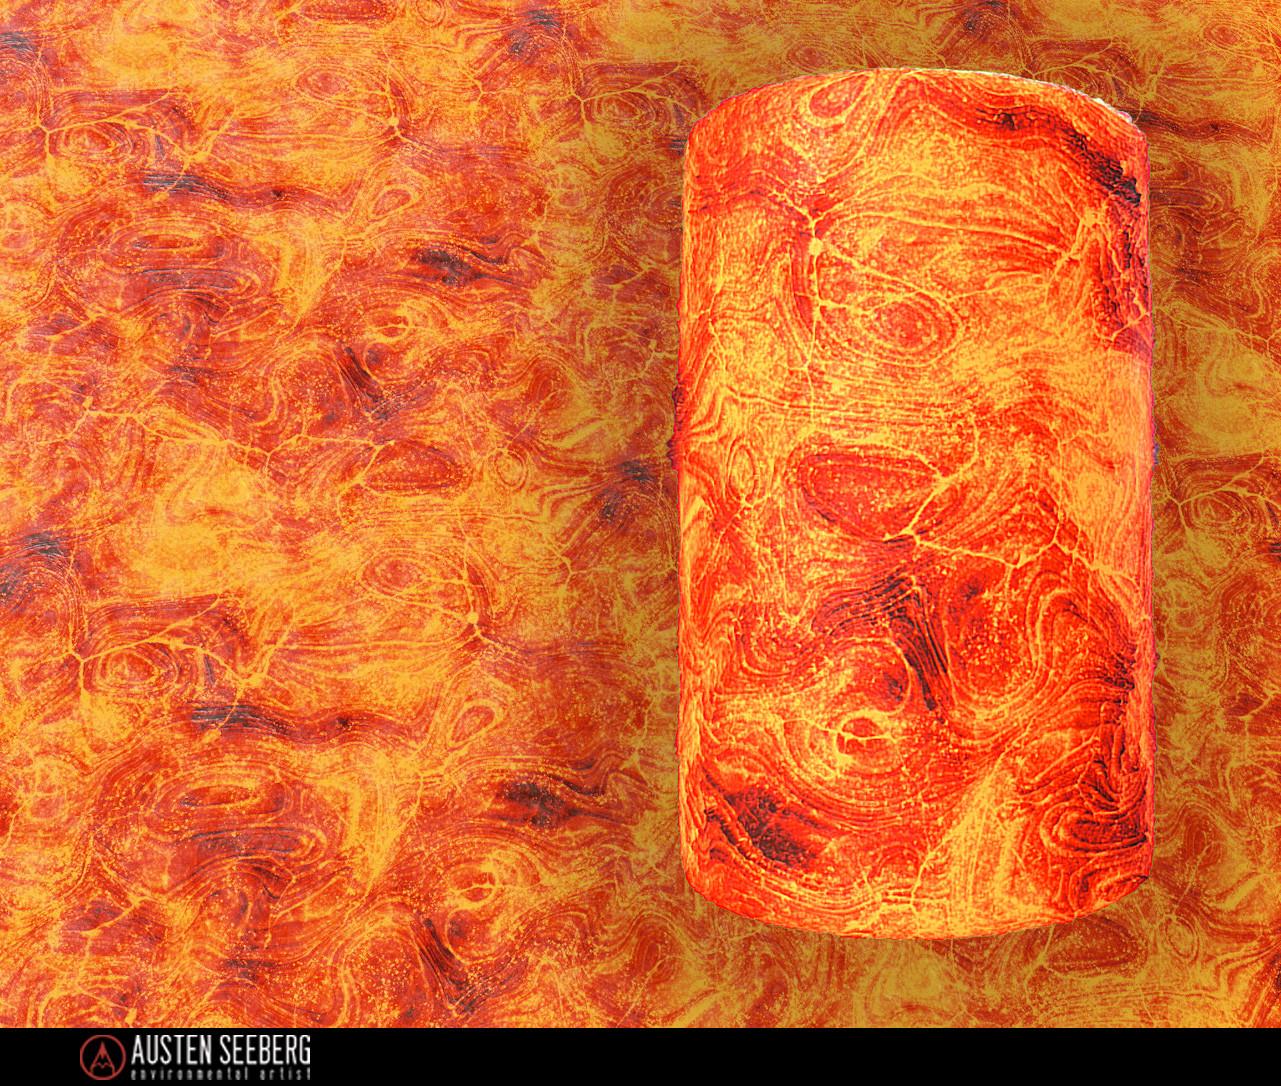 Austen seeberg hotcomp